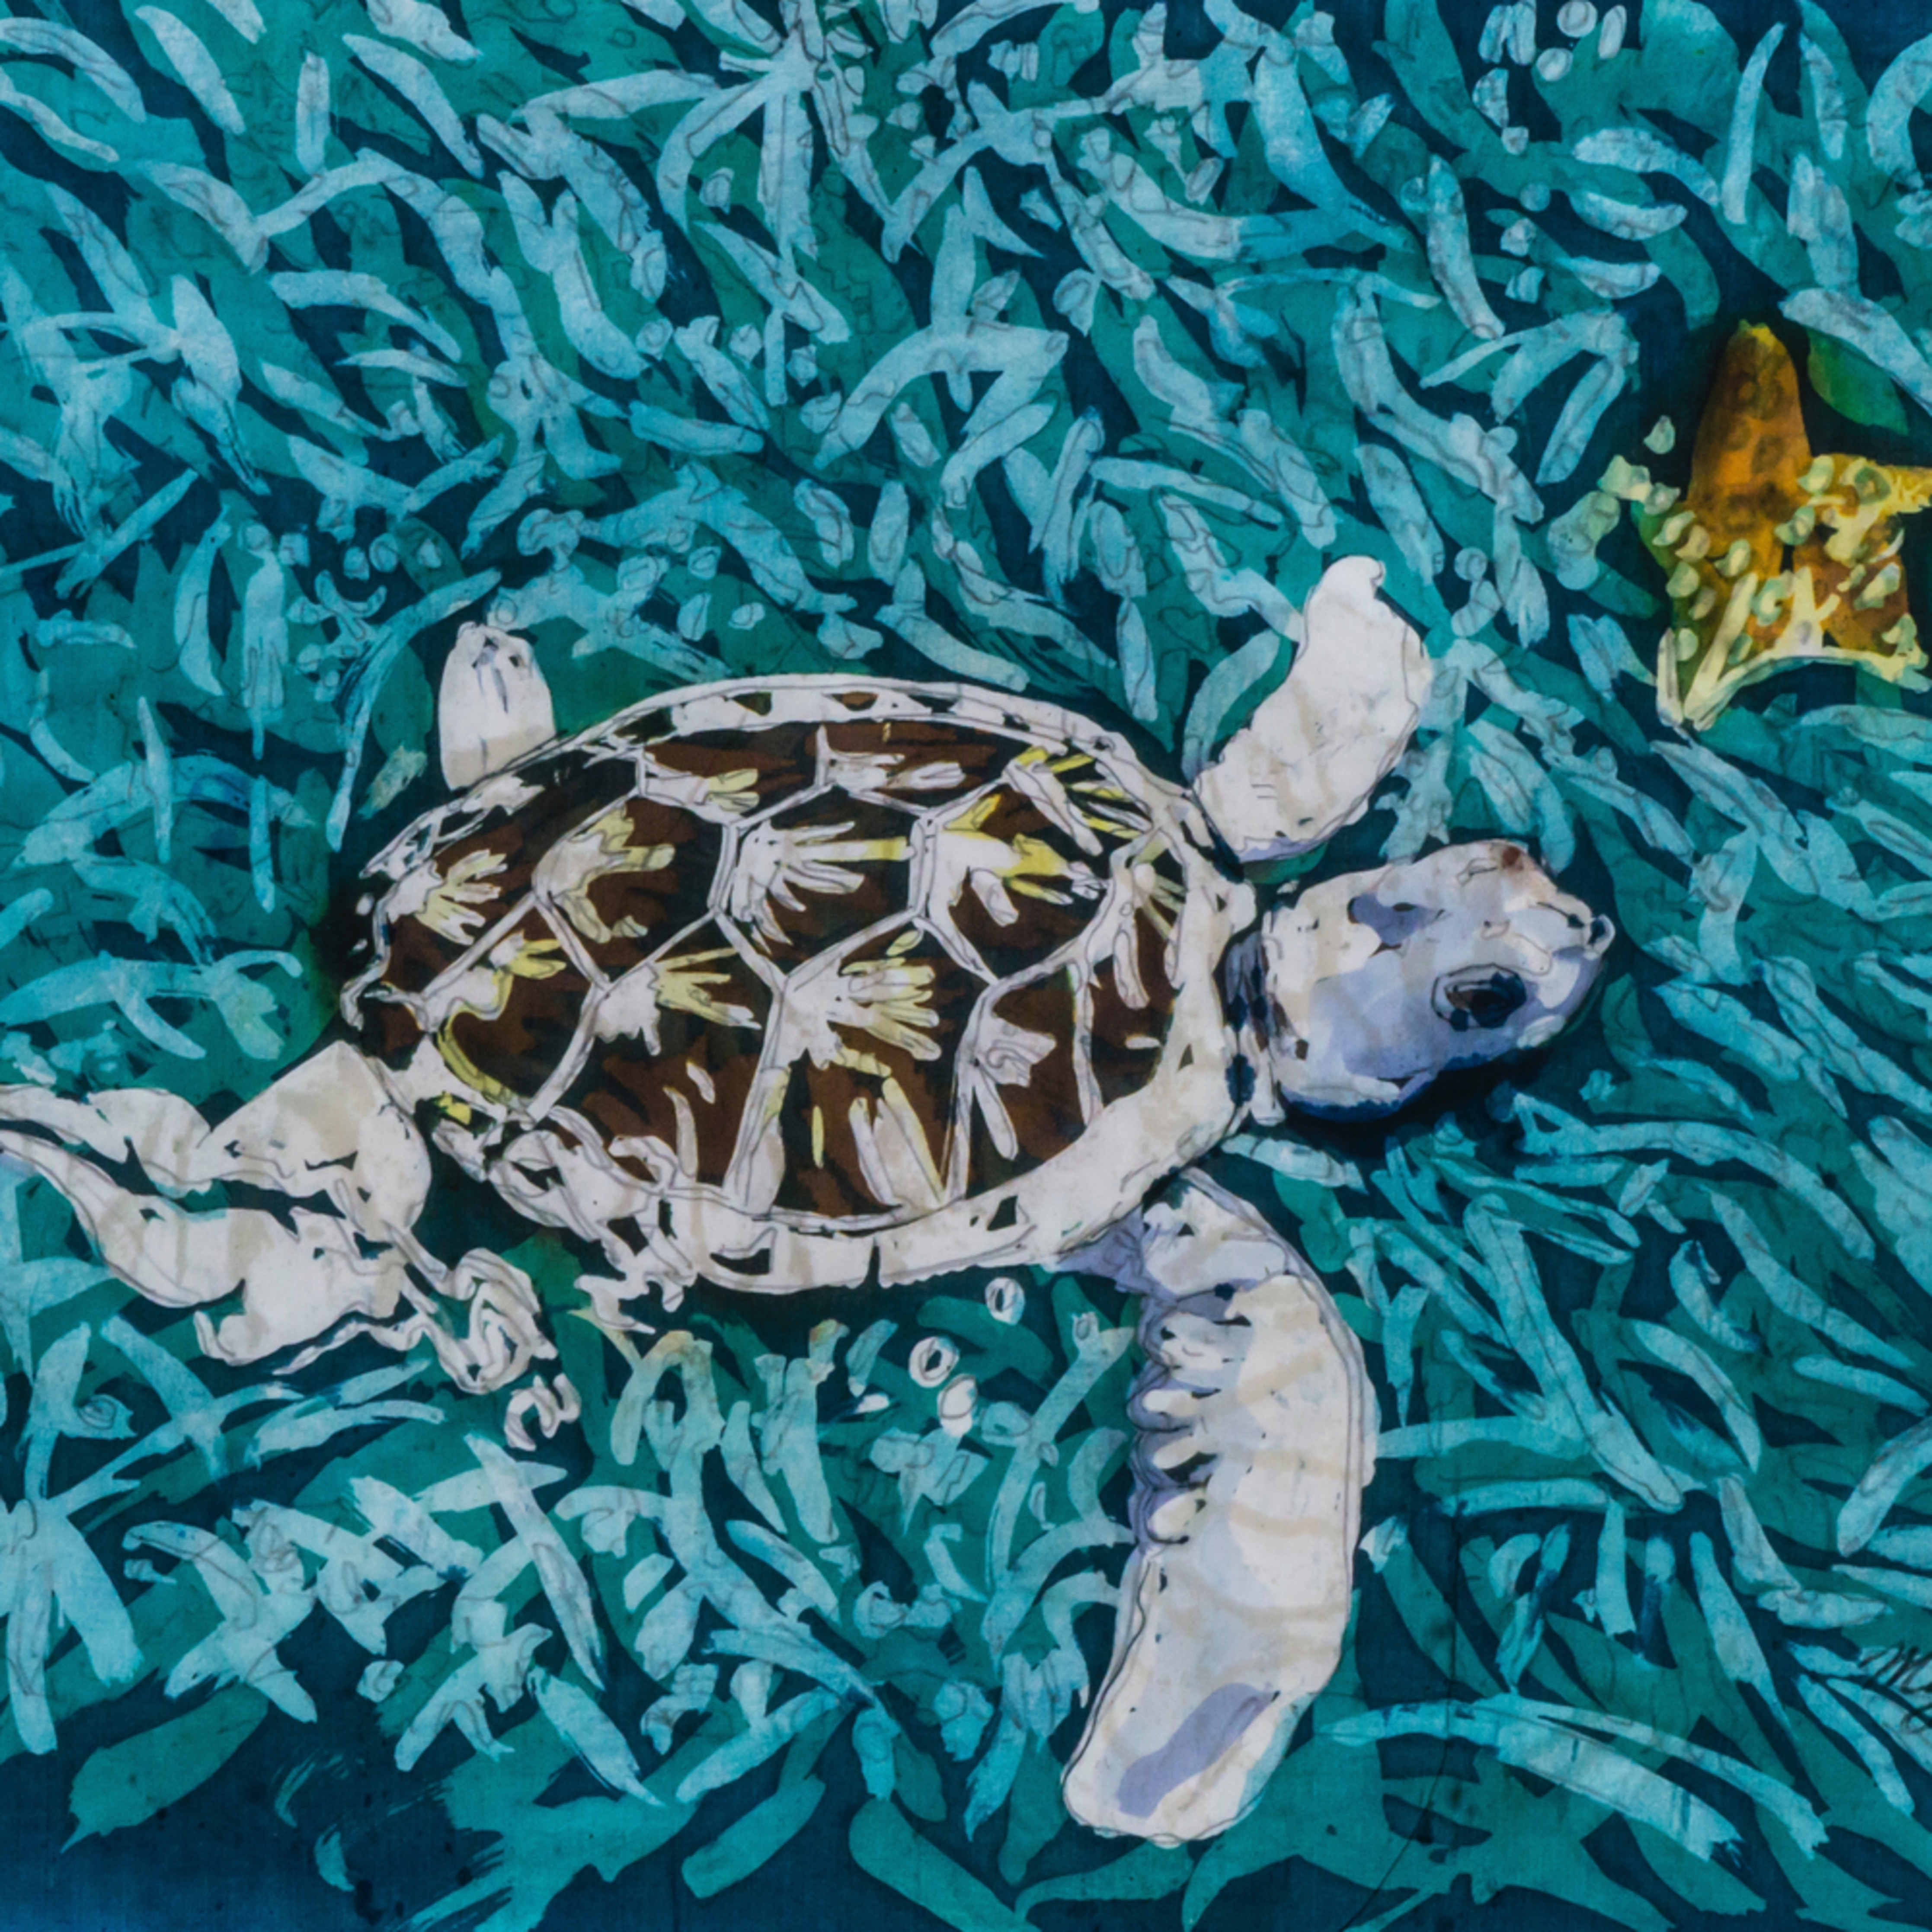 Muffy clark gill tortuga blanca 1 rozome on silk 16 x 20 in deu0g4